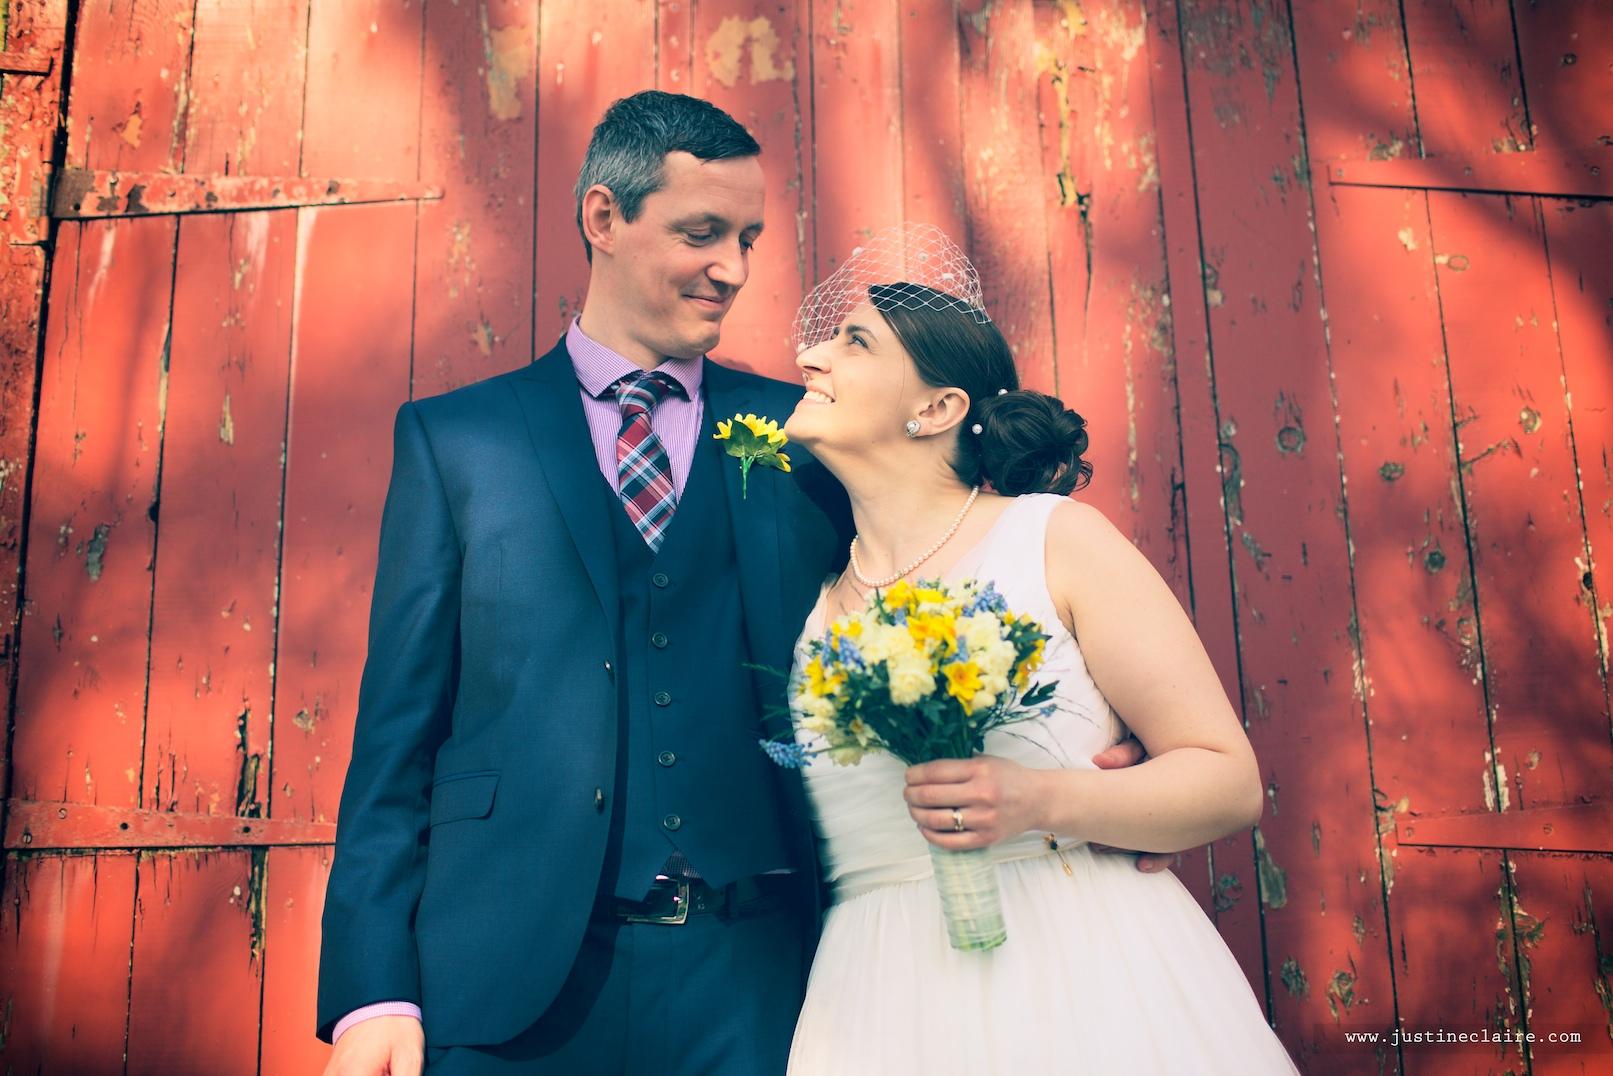 Arundel Wedding Photographers, Photographers in Sussex